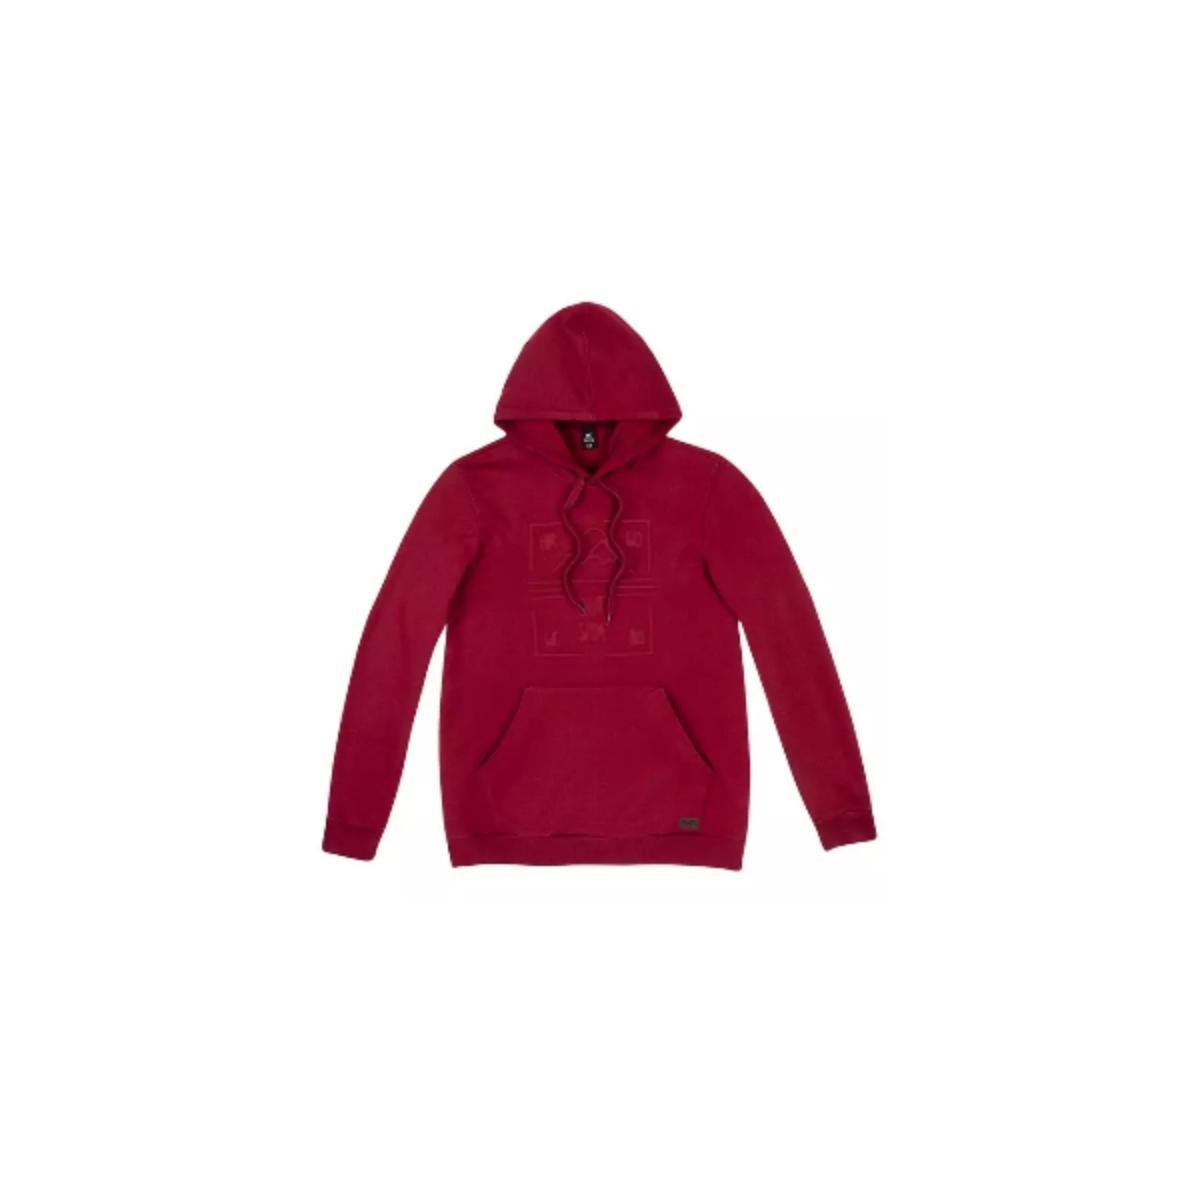 Blusão Masculino Hering 04bk Rysen Vermelho